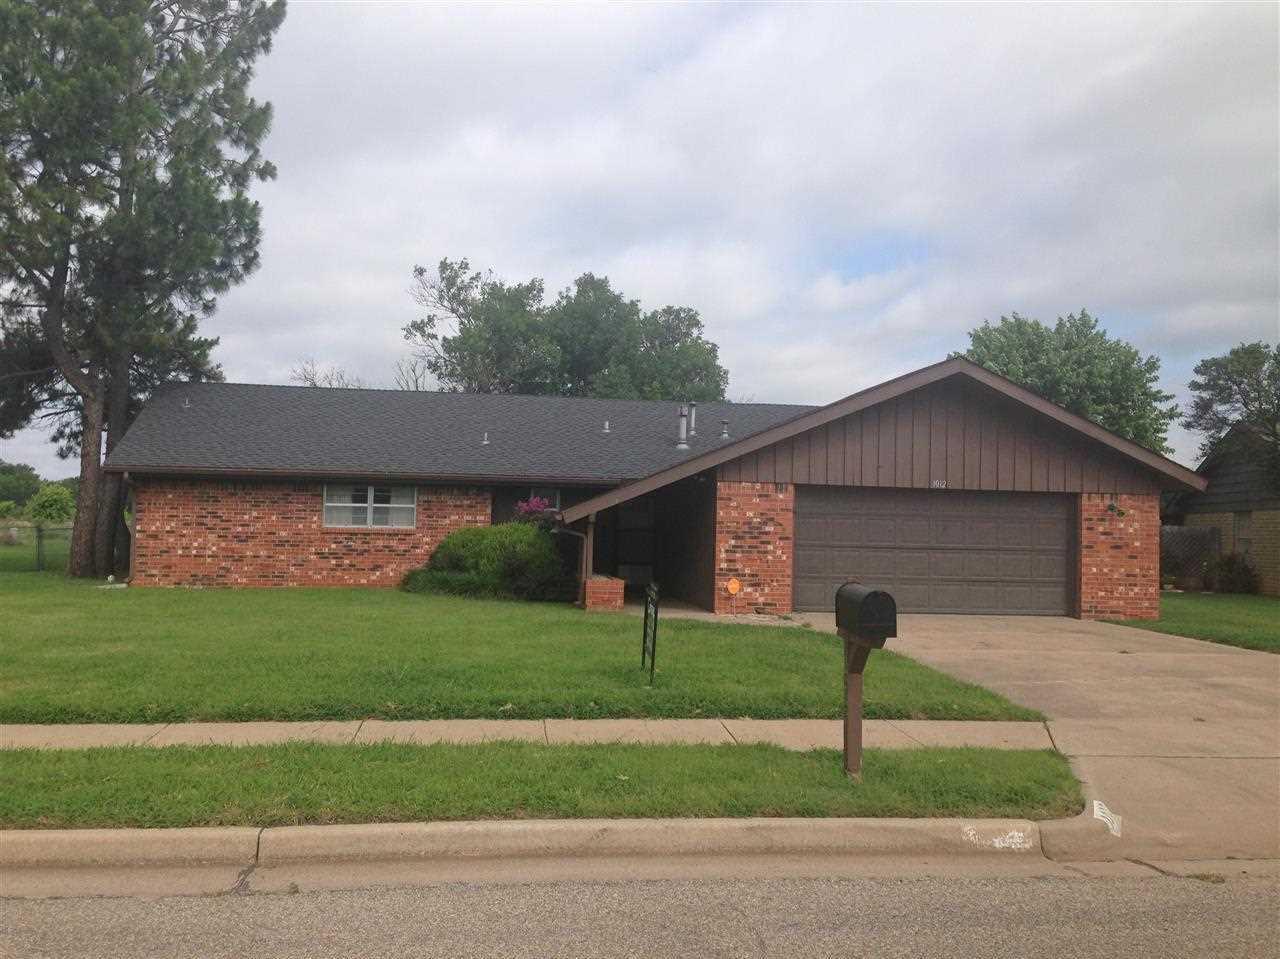 Sold Cross Sale W/ MLS | 1012 Rosedale Ponca City, OK 74604 0